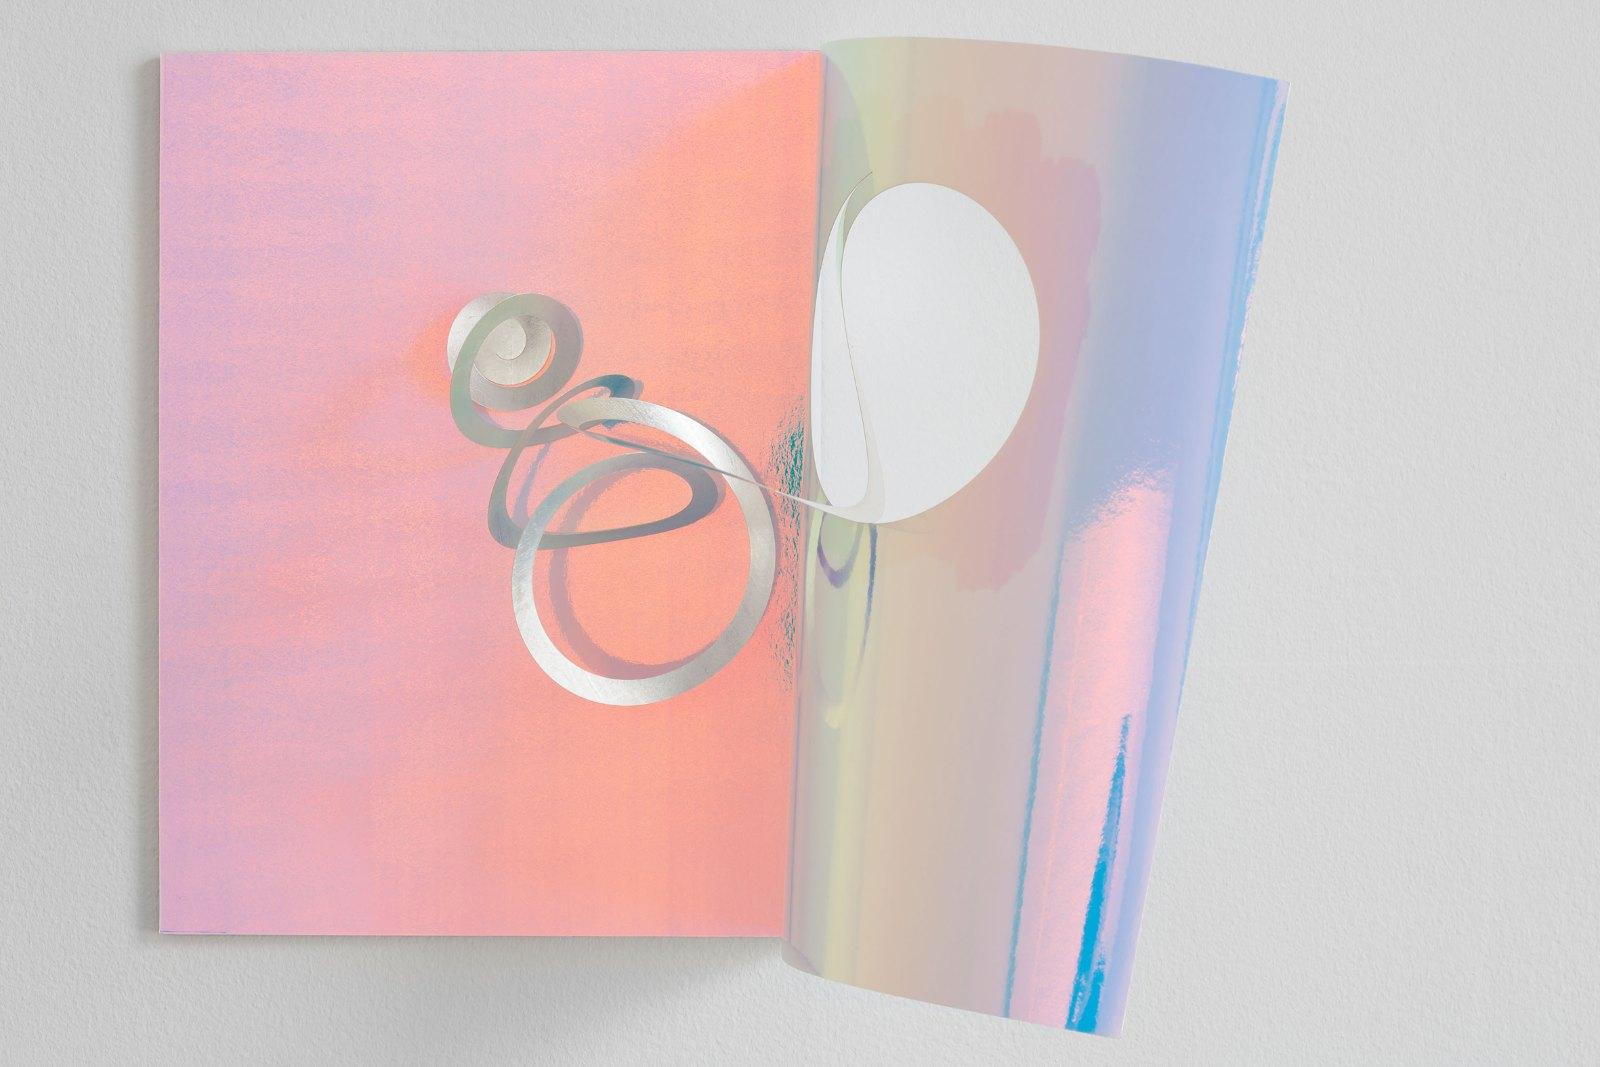 Stay put, 2013, Card board, leaf silver, wooden panel, 30 x 40 x 0,5 cm